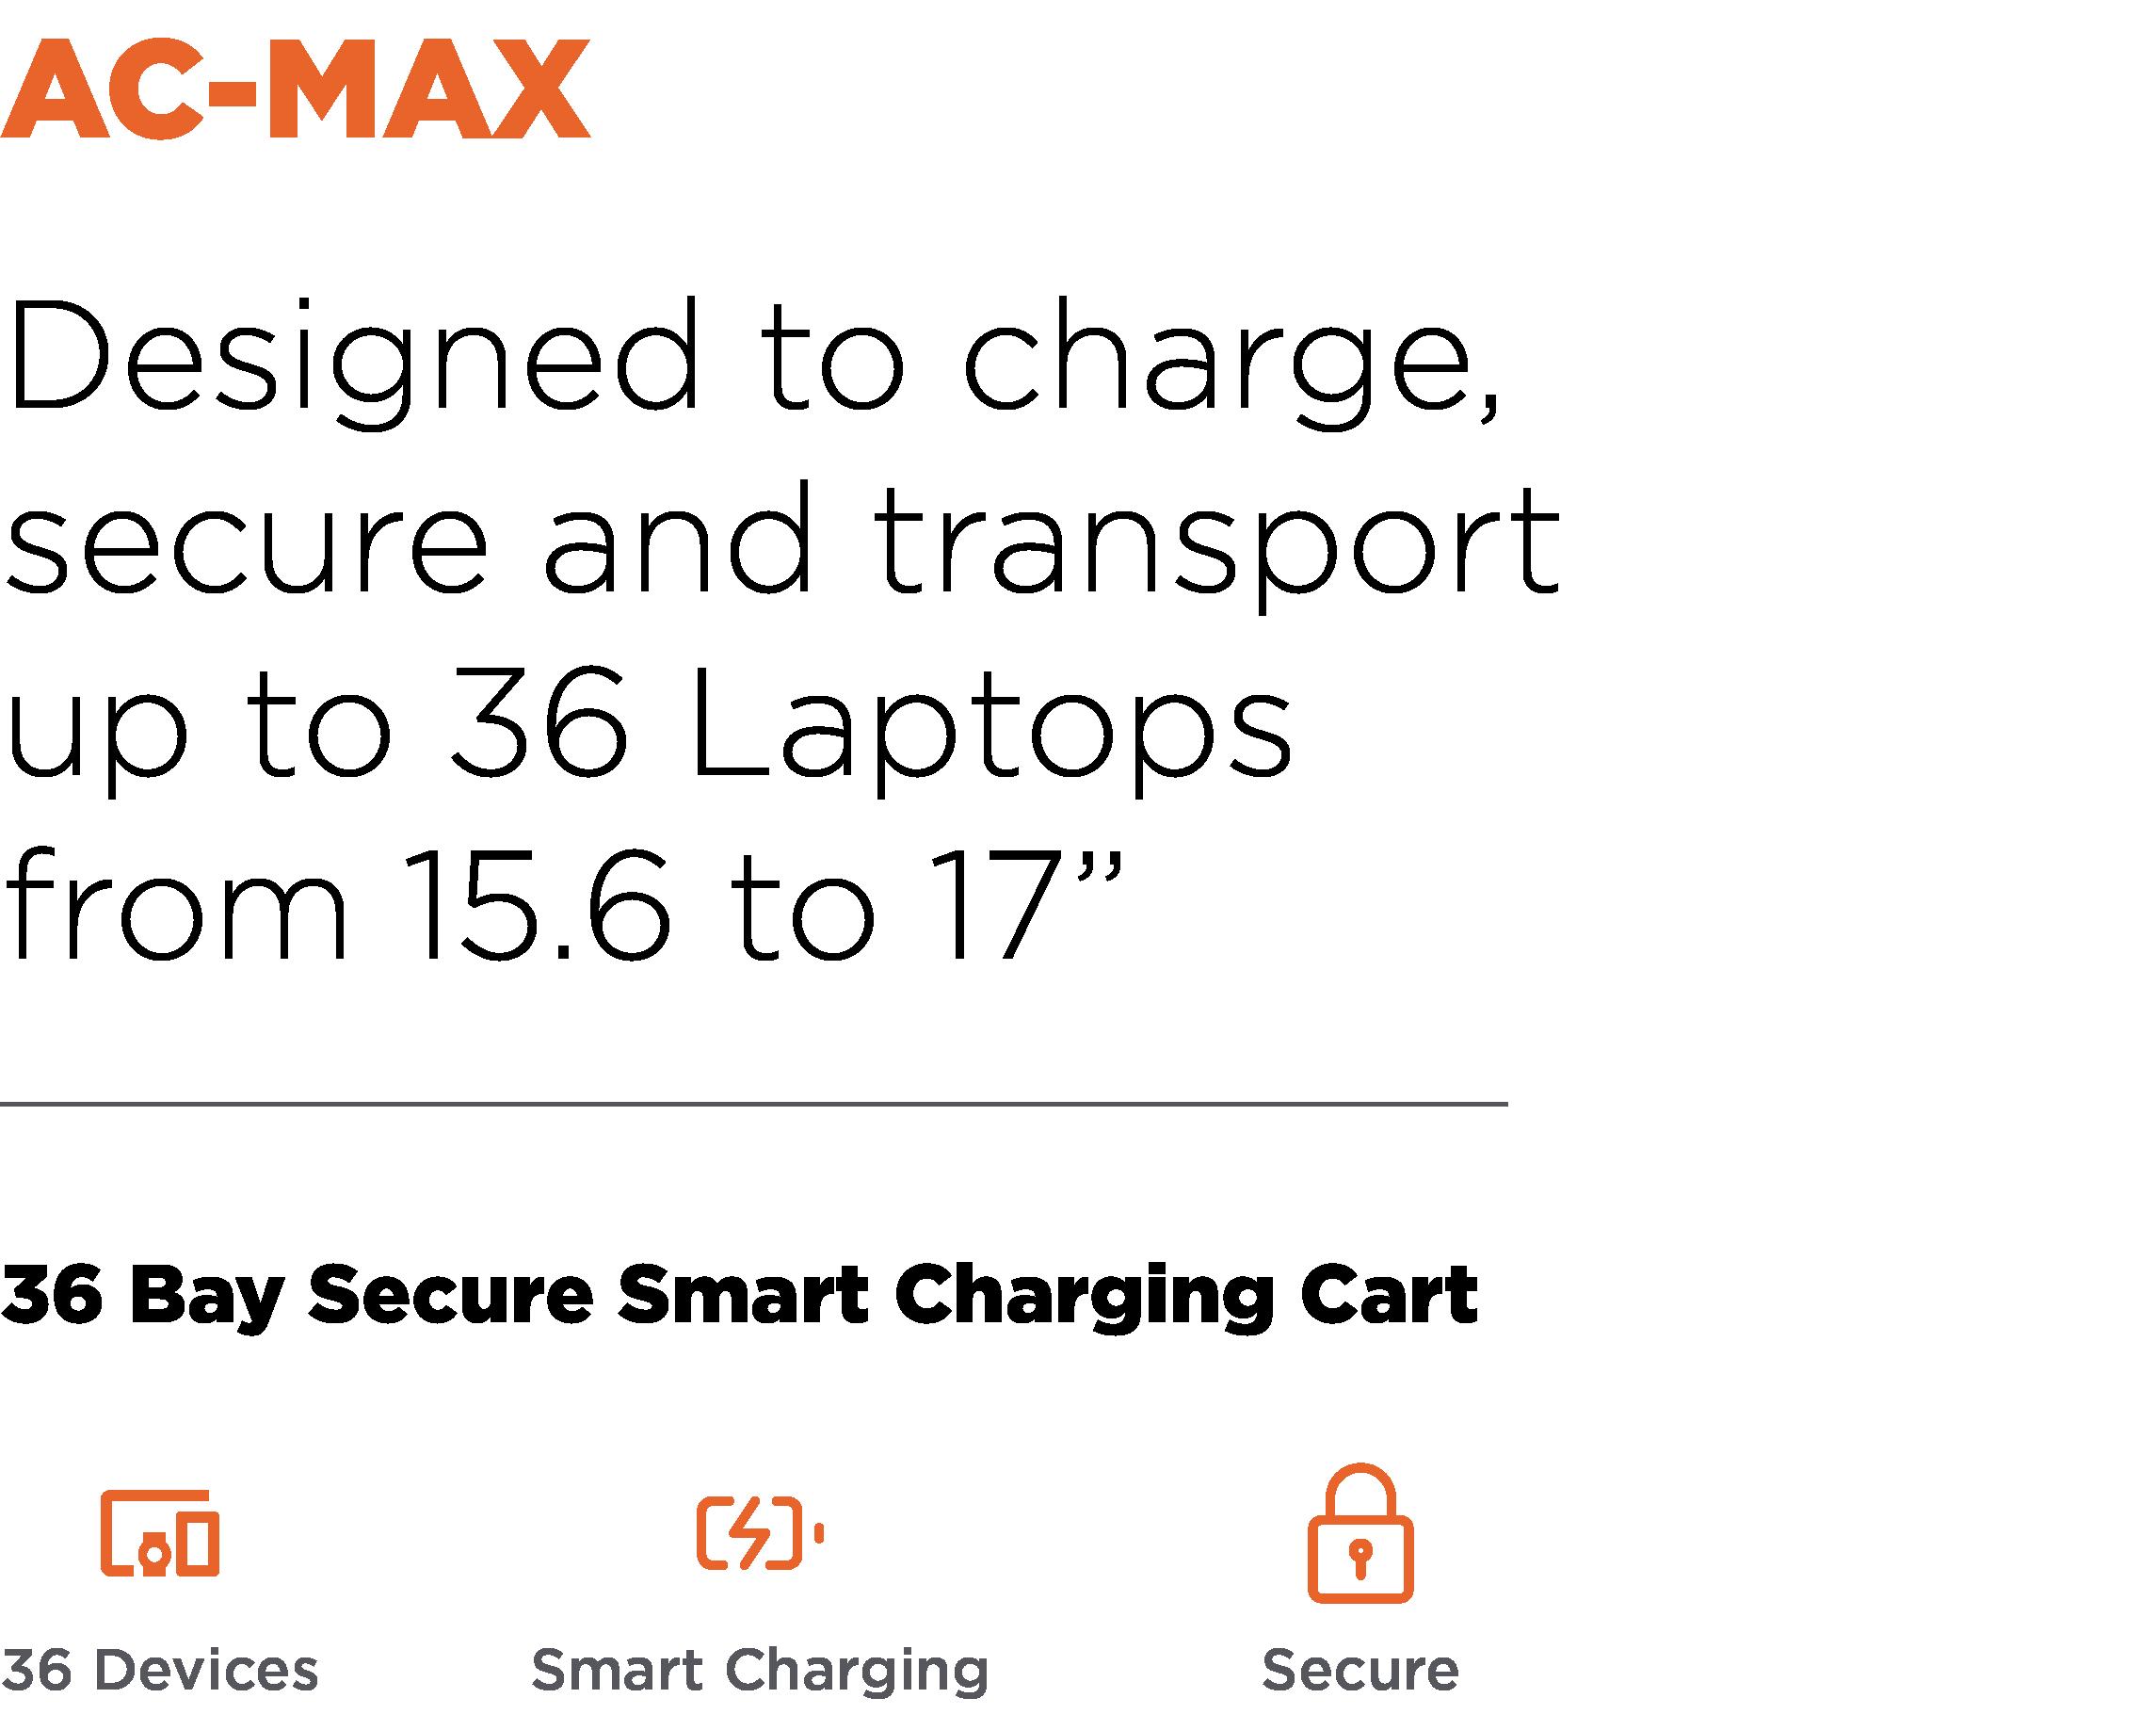 Anywhere Cart AC-MAX: 36 Bay Secure Smart Charging Cart